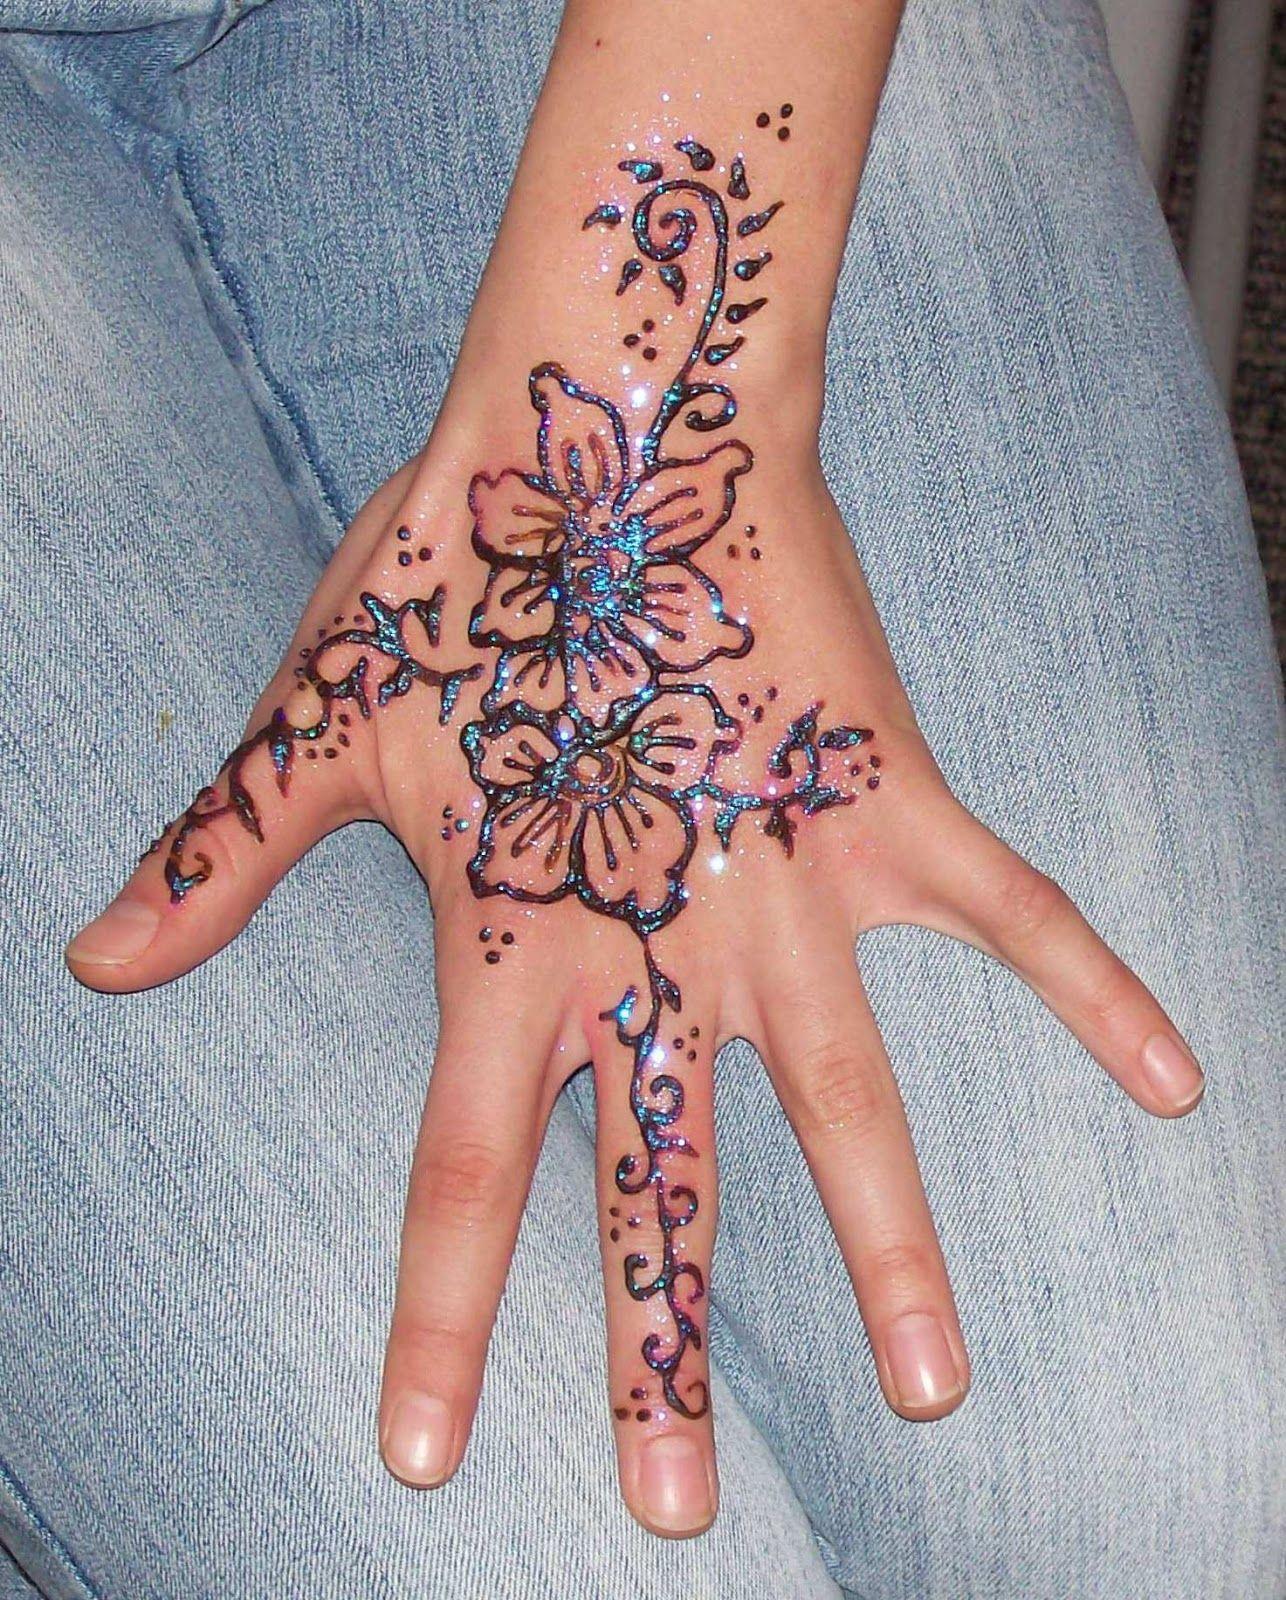 30 Henna Tattoos Design Ideas For Girls Smile Henna Tattoos